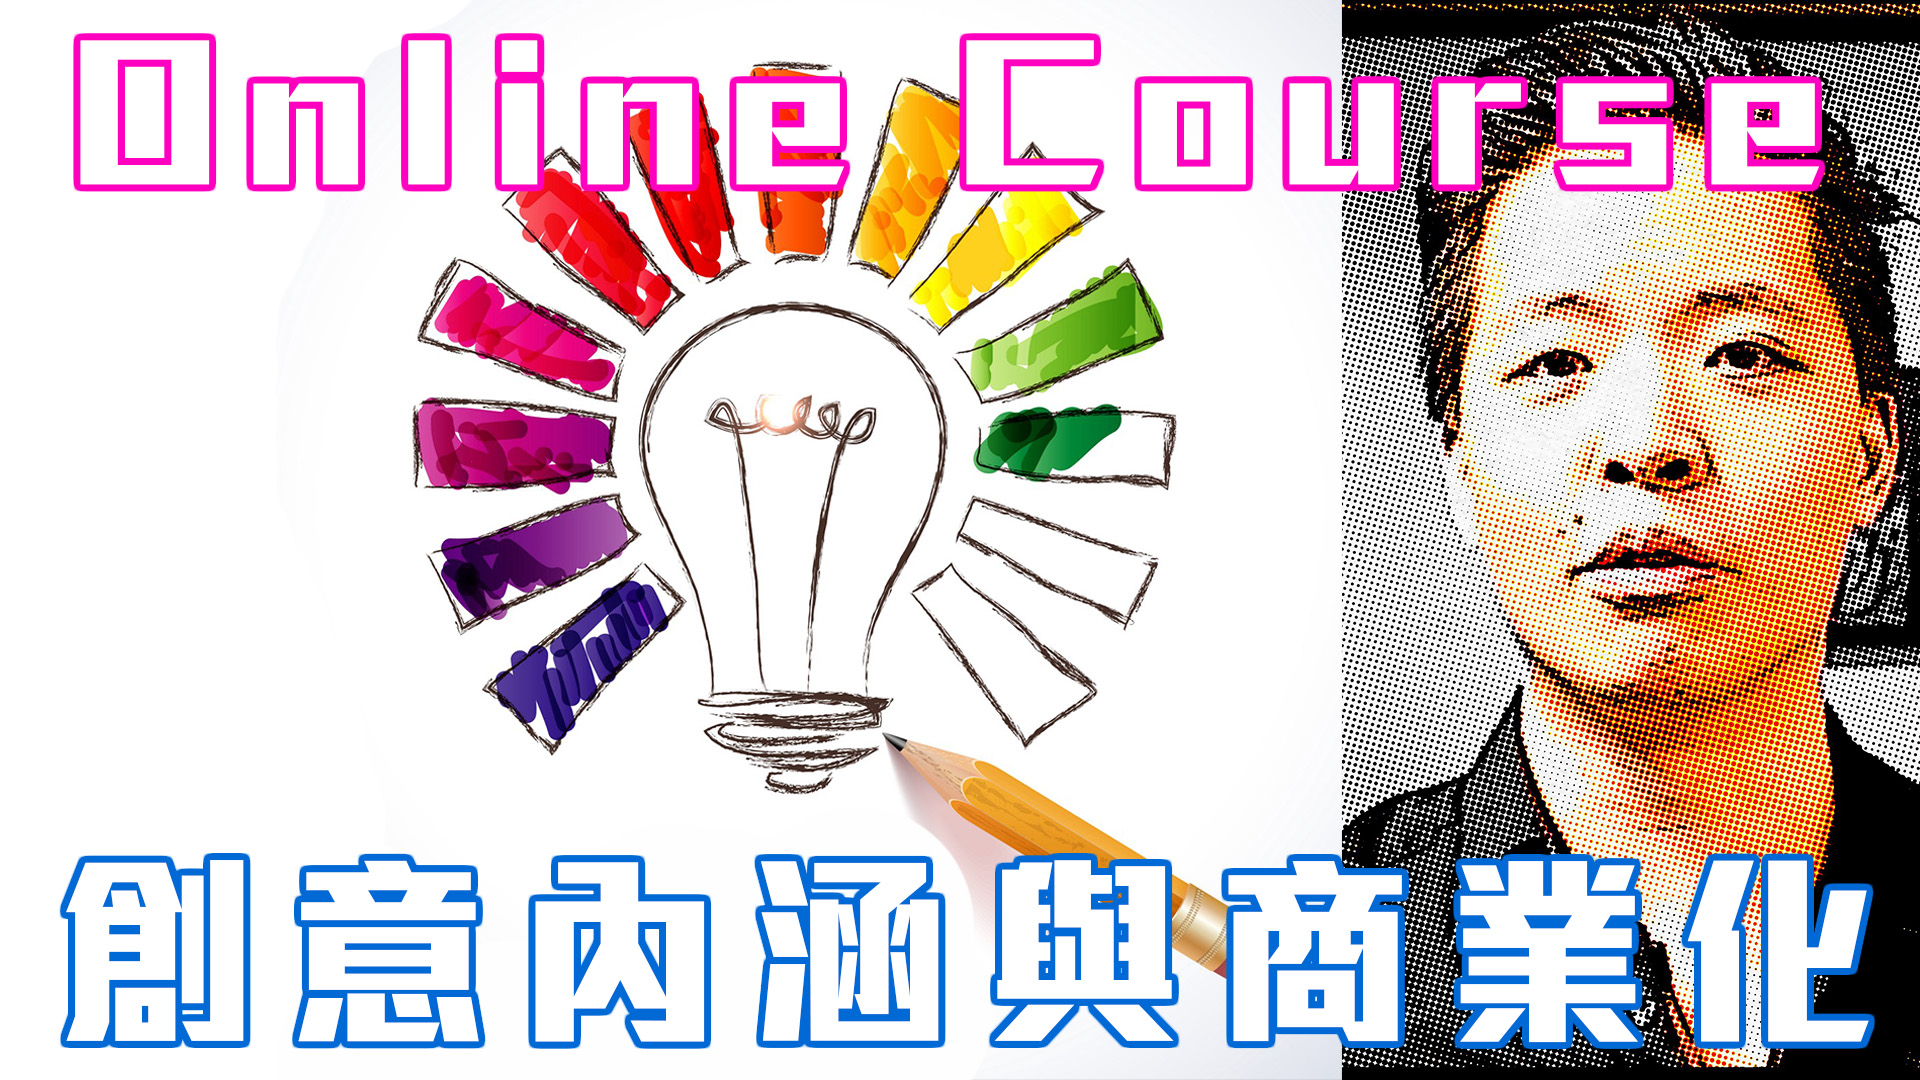 創意與商業化 | Michael Andrew Law Dojo | Art School | 畫畫教學網站|線上畫畫課程 | 賣畫賺錢